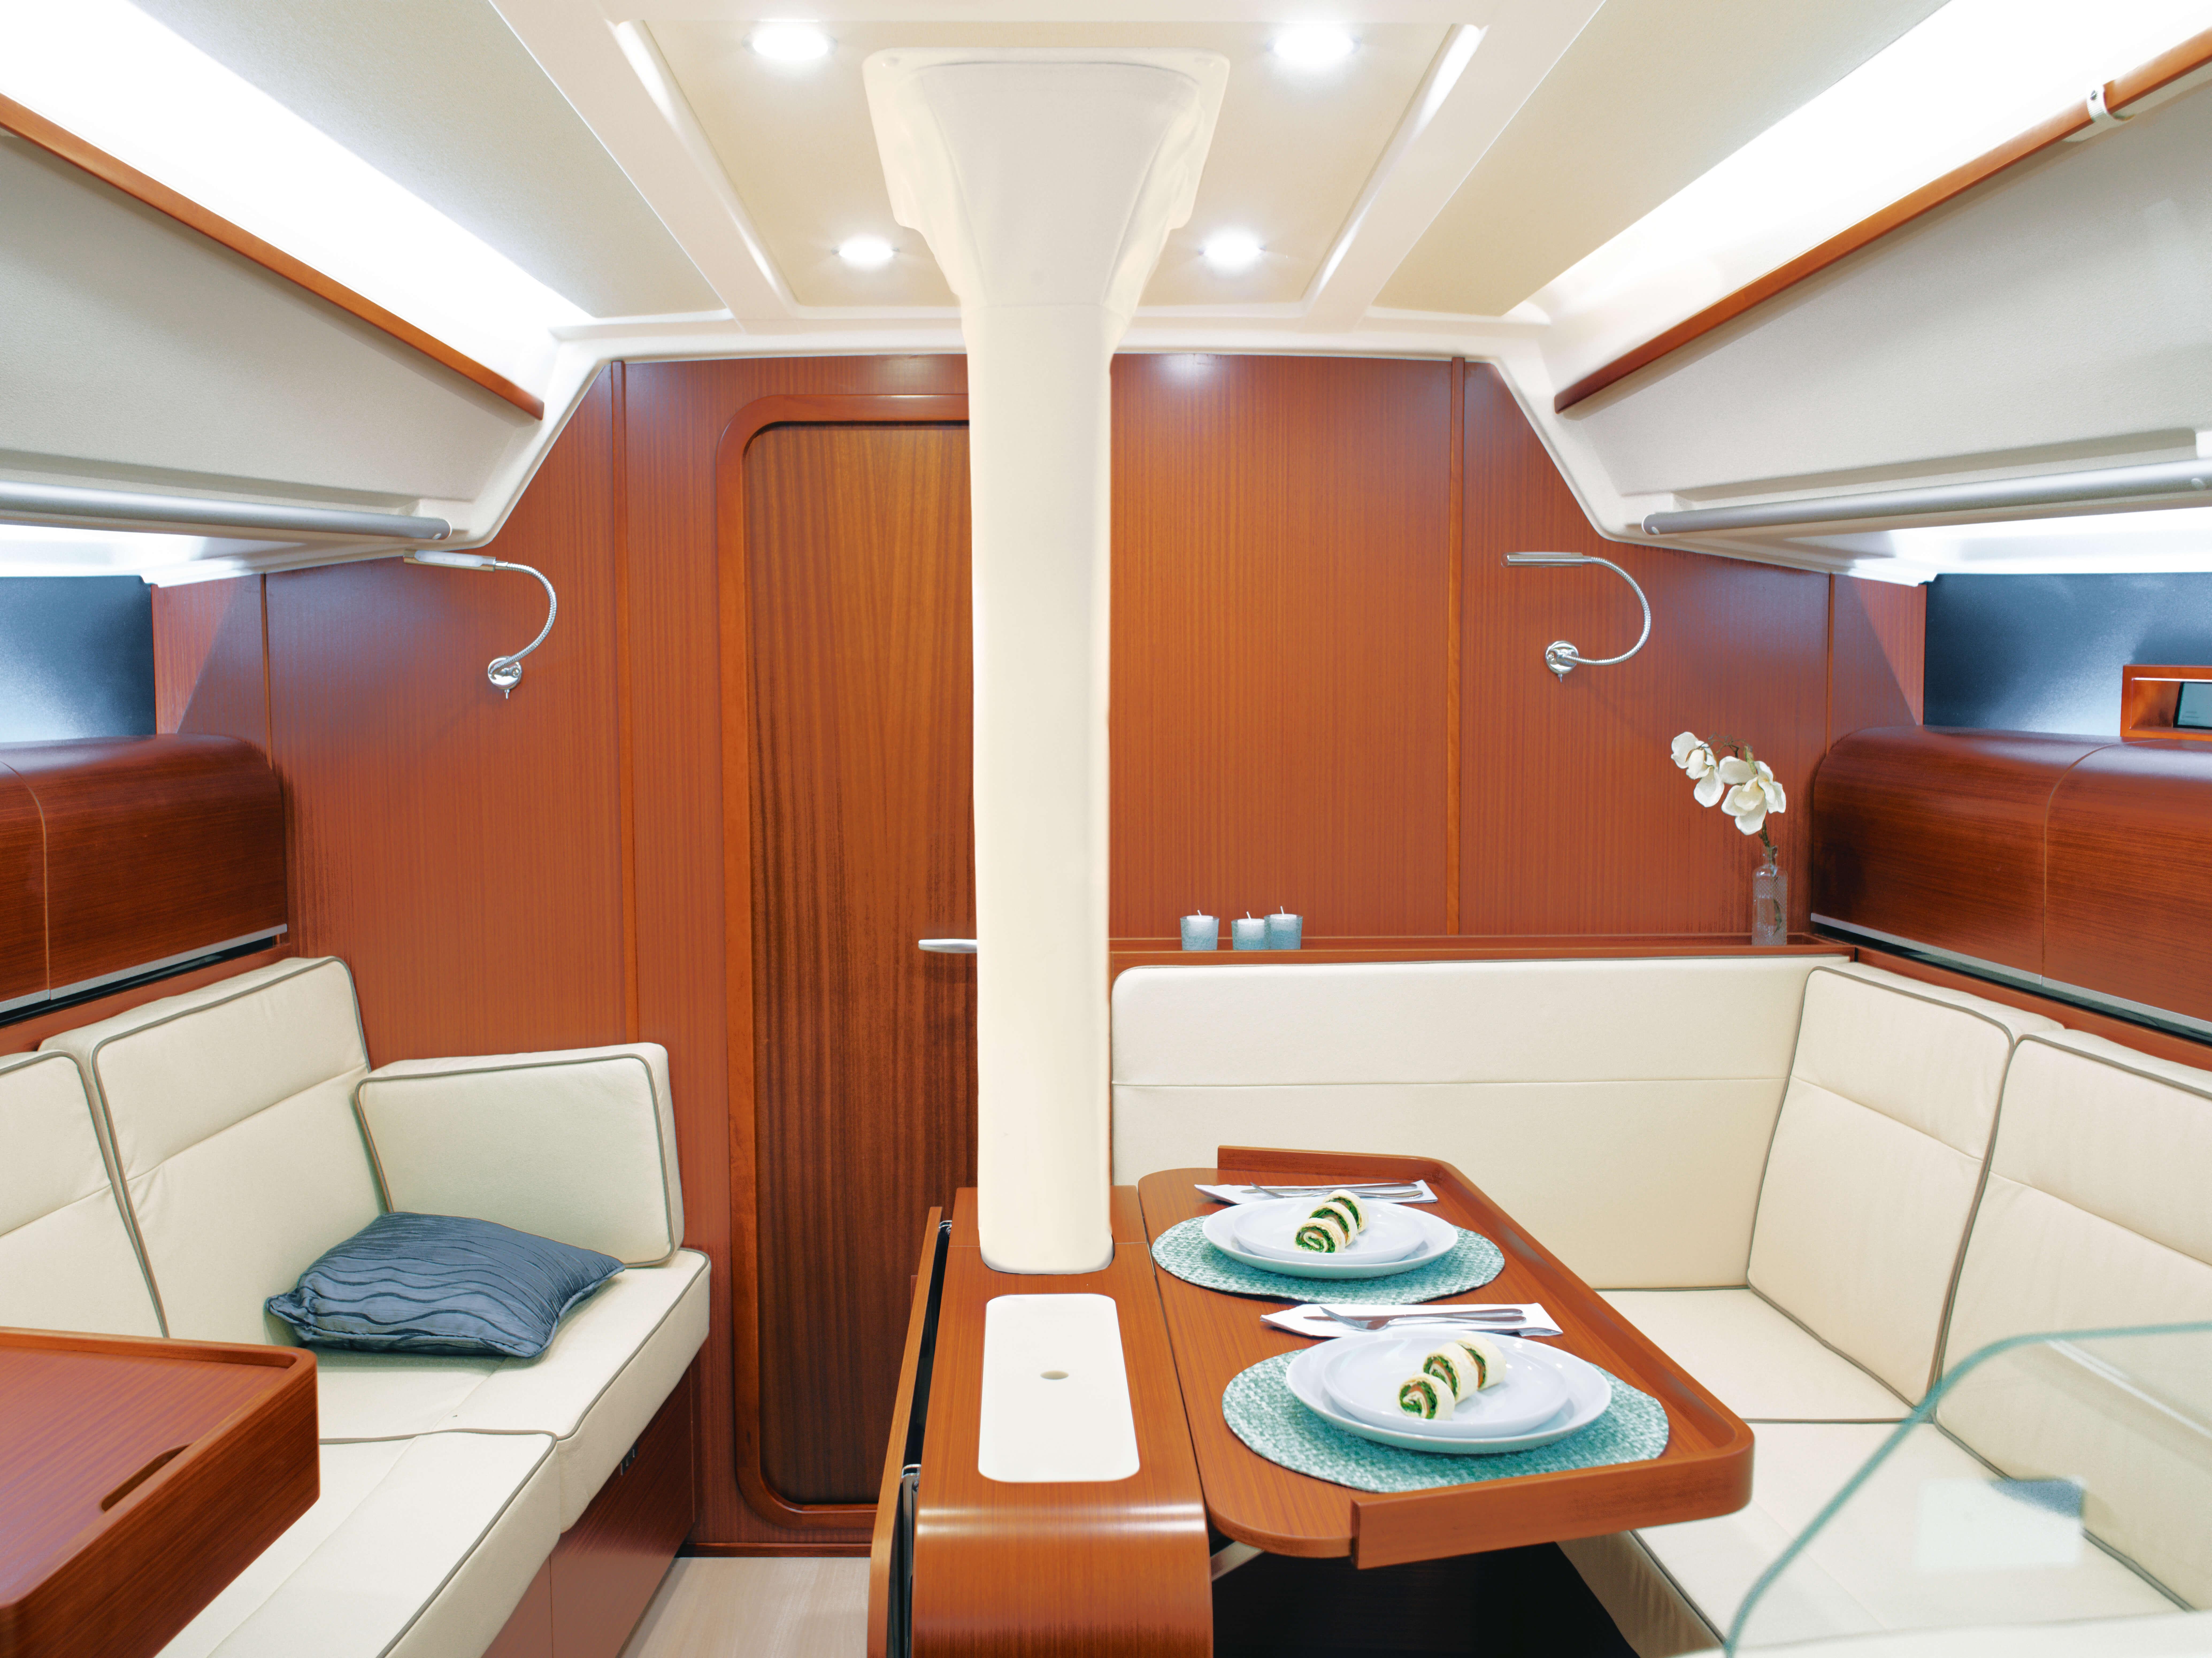 Dehler 42 Interno salone | mahogany, zona di seduta, tavolo pieghevole, finestra | Dehler